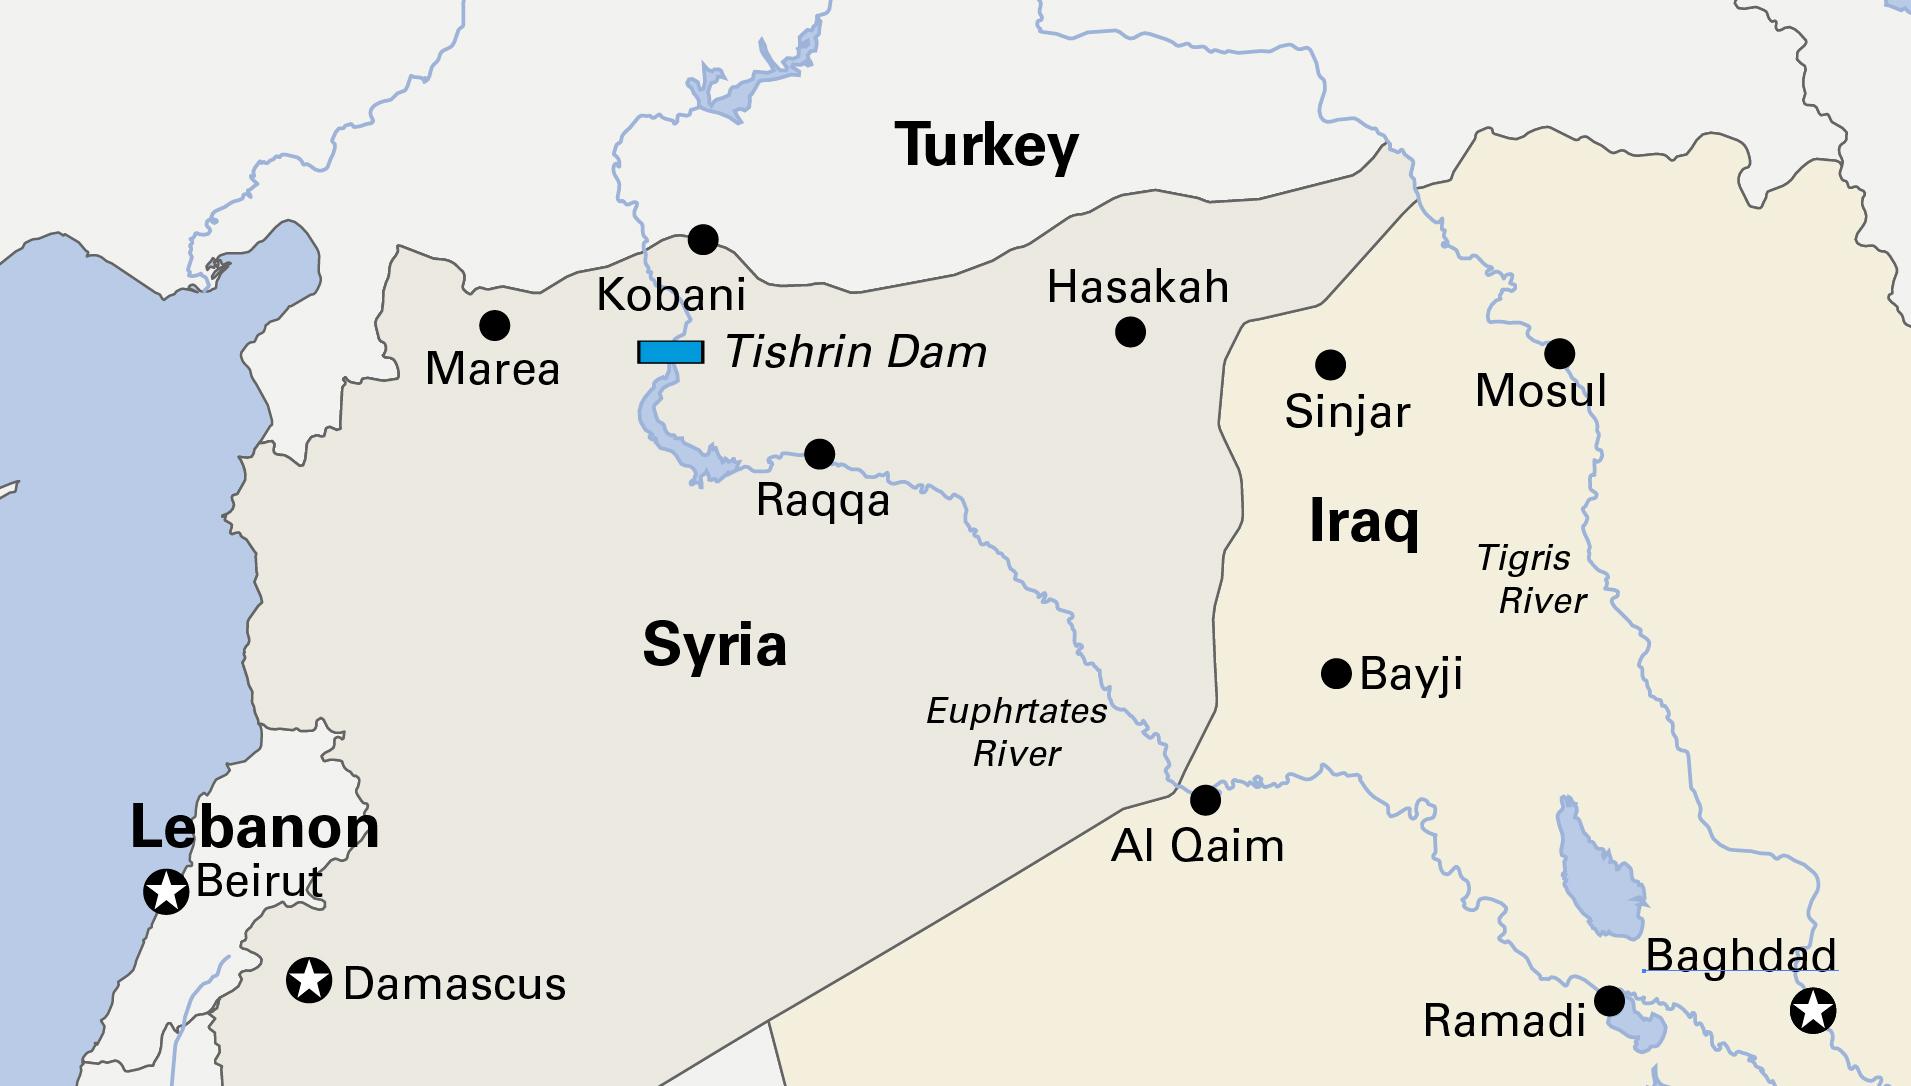 635883856061776046-TNS-for-WEB-Syria-Turkey-Iraq-Map-for-long-form-2-SYRIA.jpg